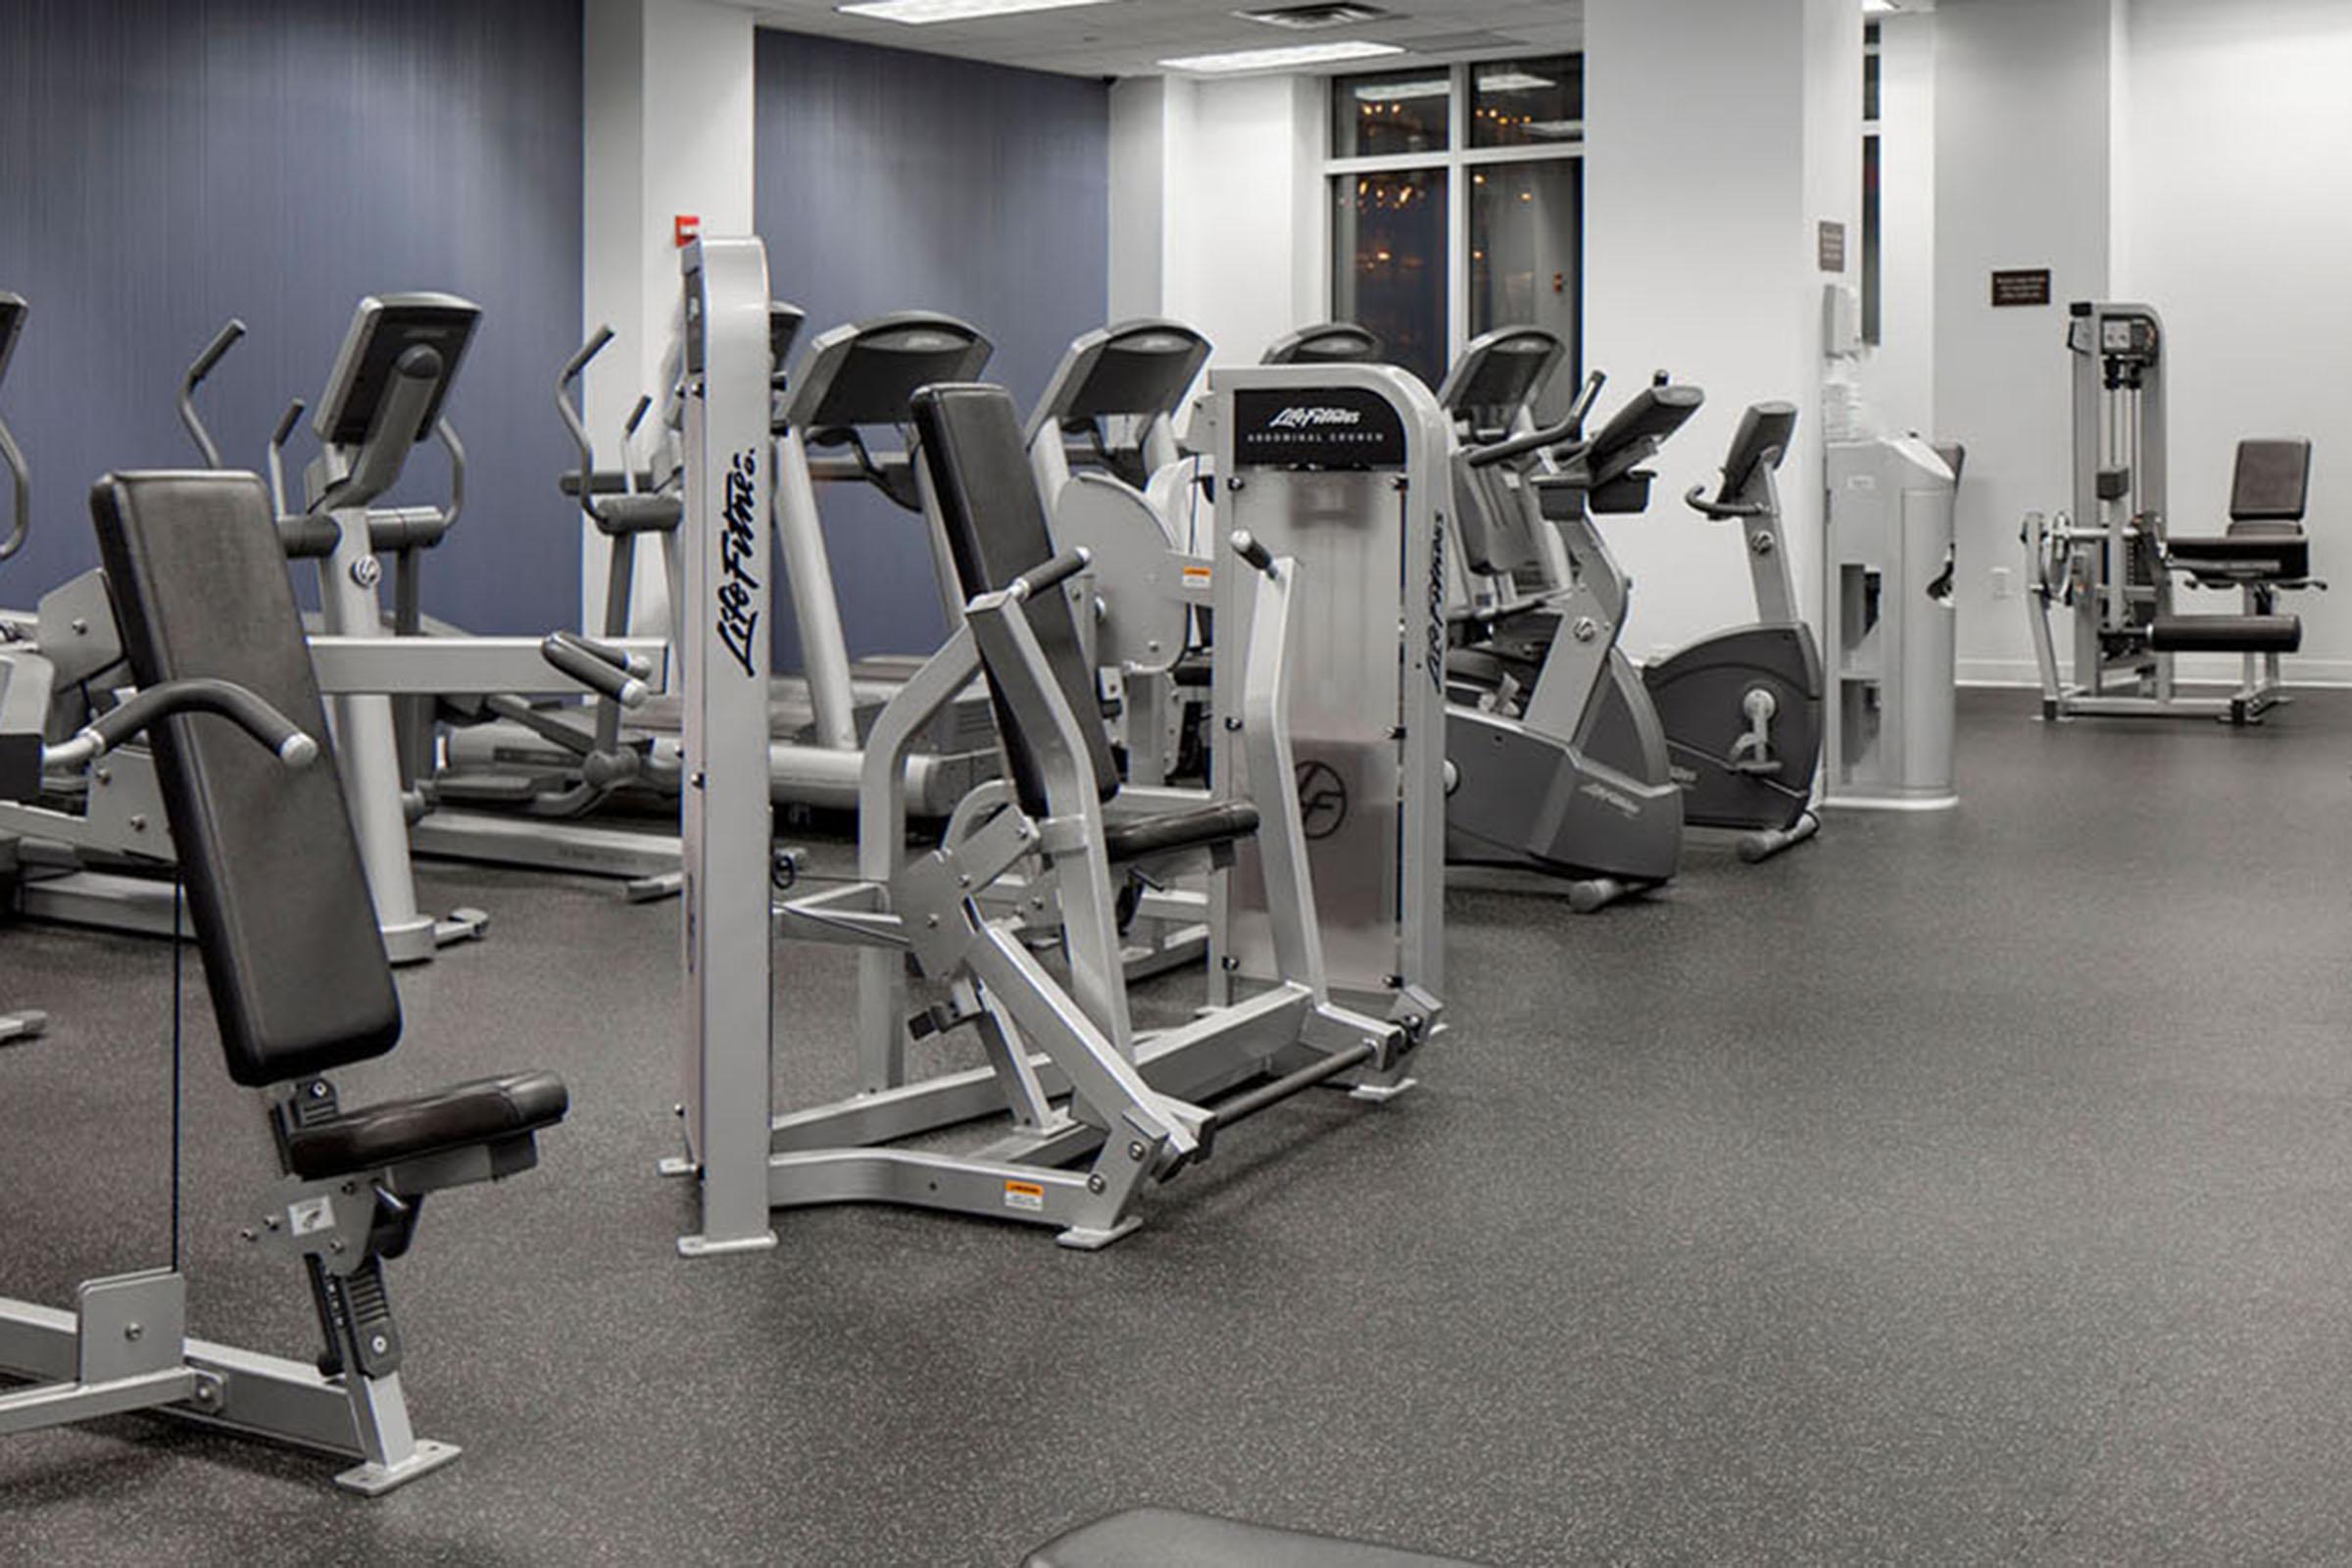 ONECP_Amenities_Fitness_Center_Machines.jpg